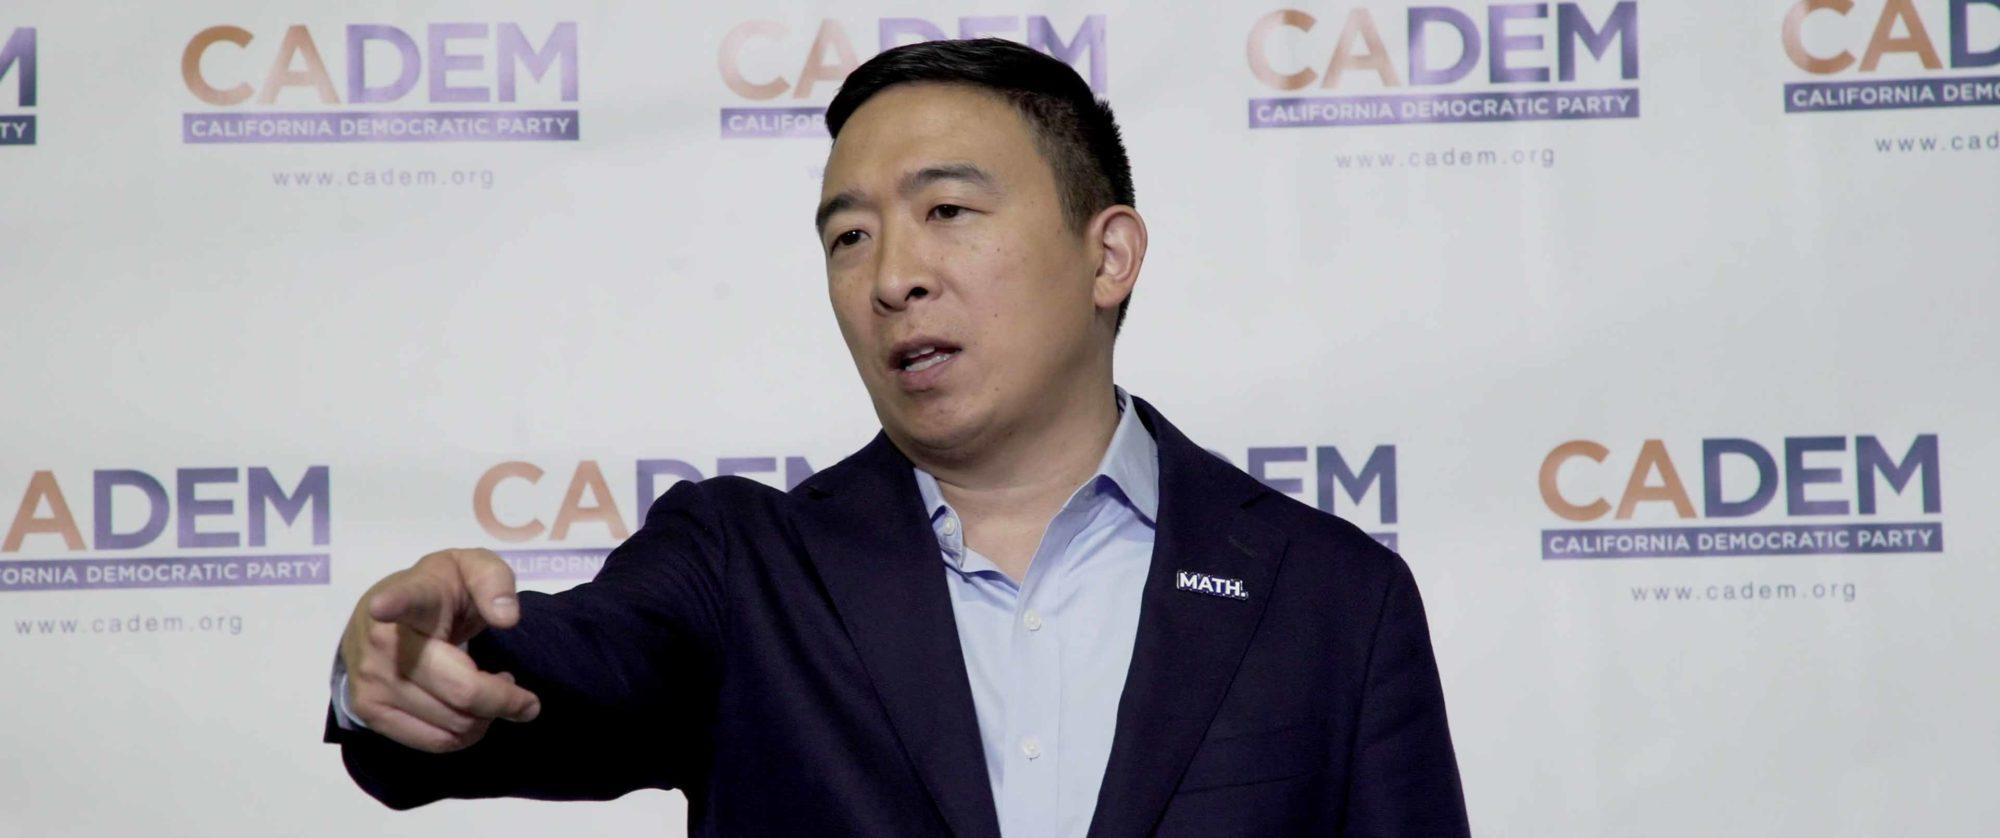 Inside the California Democratic Convention